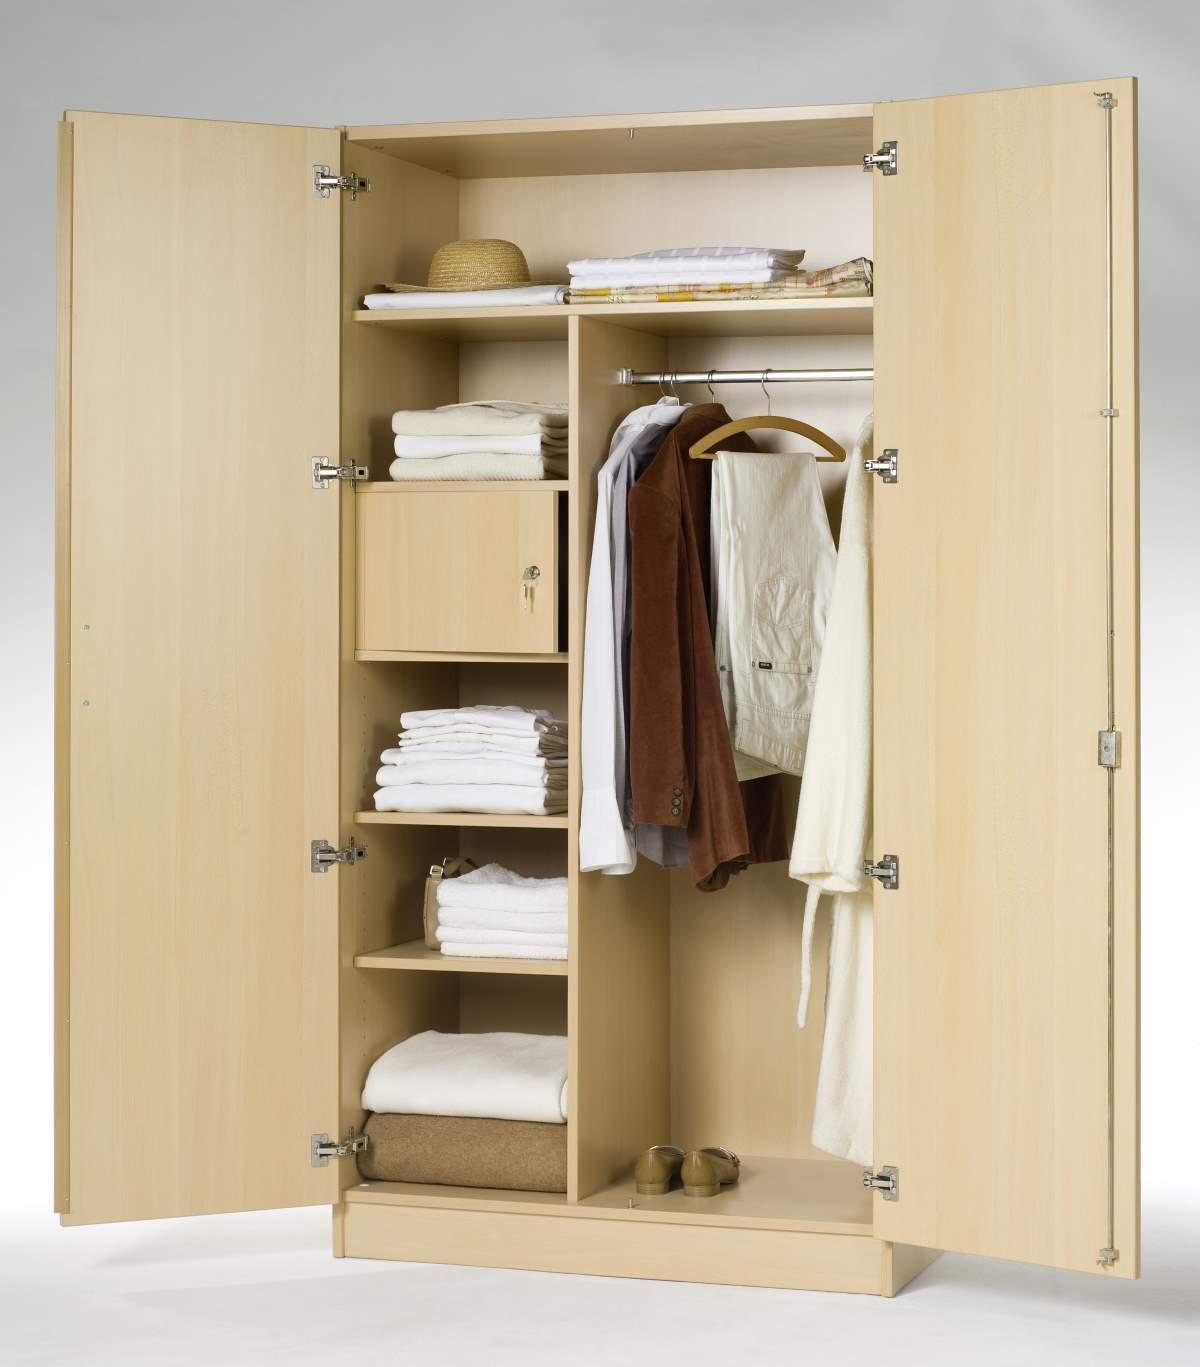 kleiderschrank typ 1806 ozg healthcare. Black Bedroom Furniture Sets. Home Design Ideas